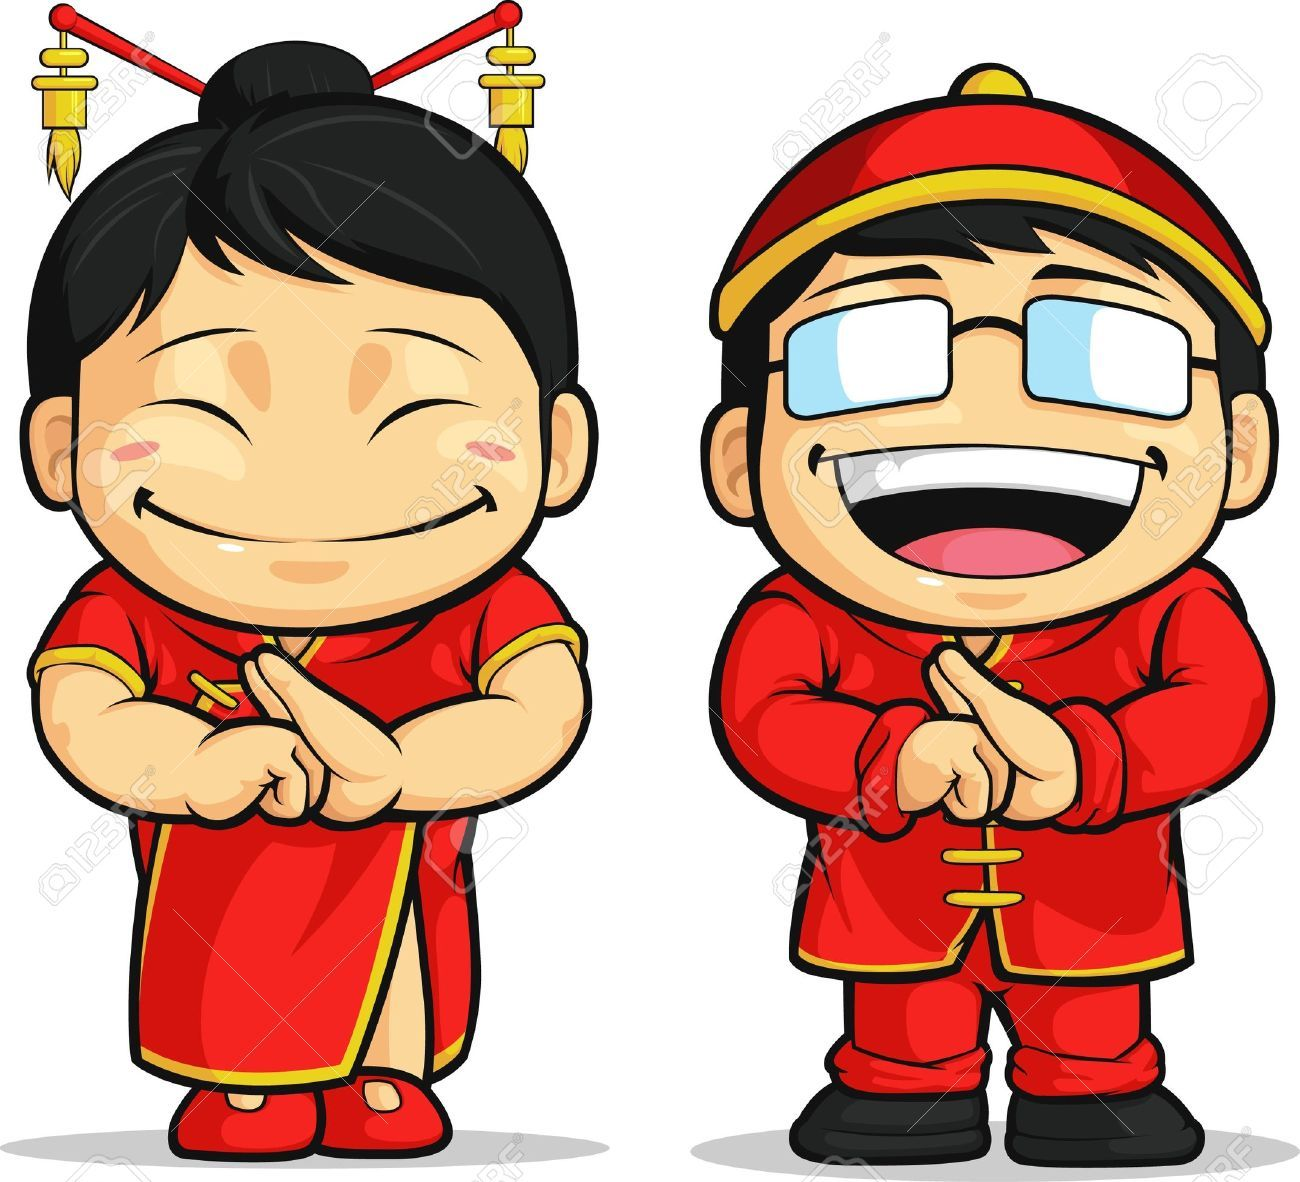 Cartoon of boy girl. China clipart kid chinese